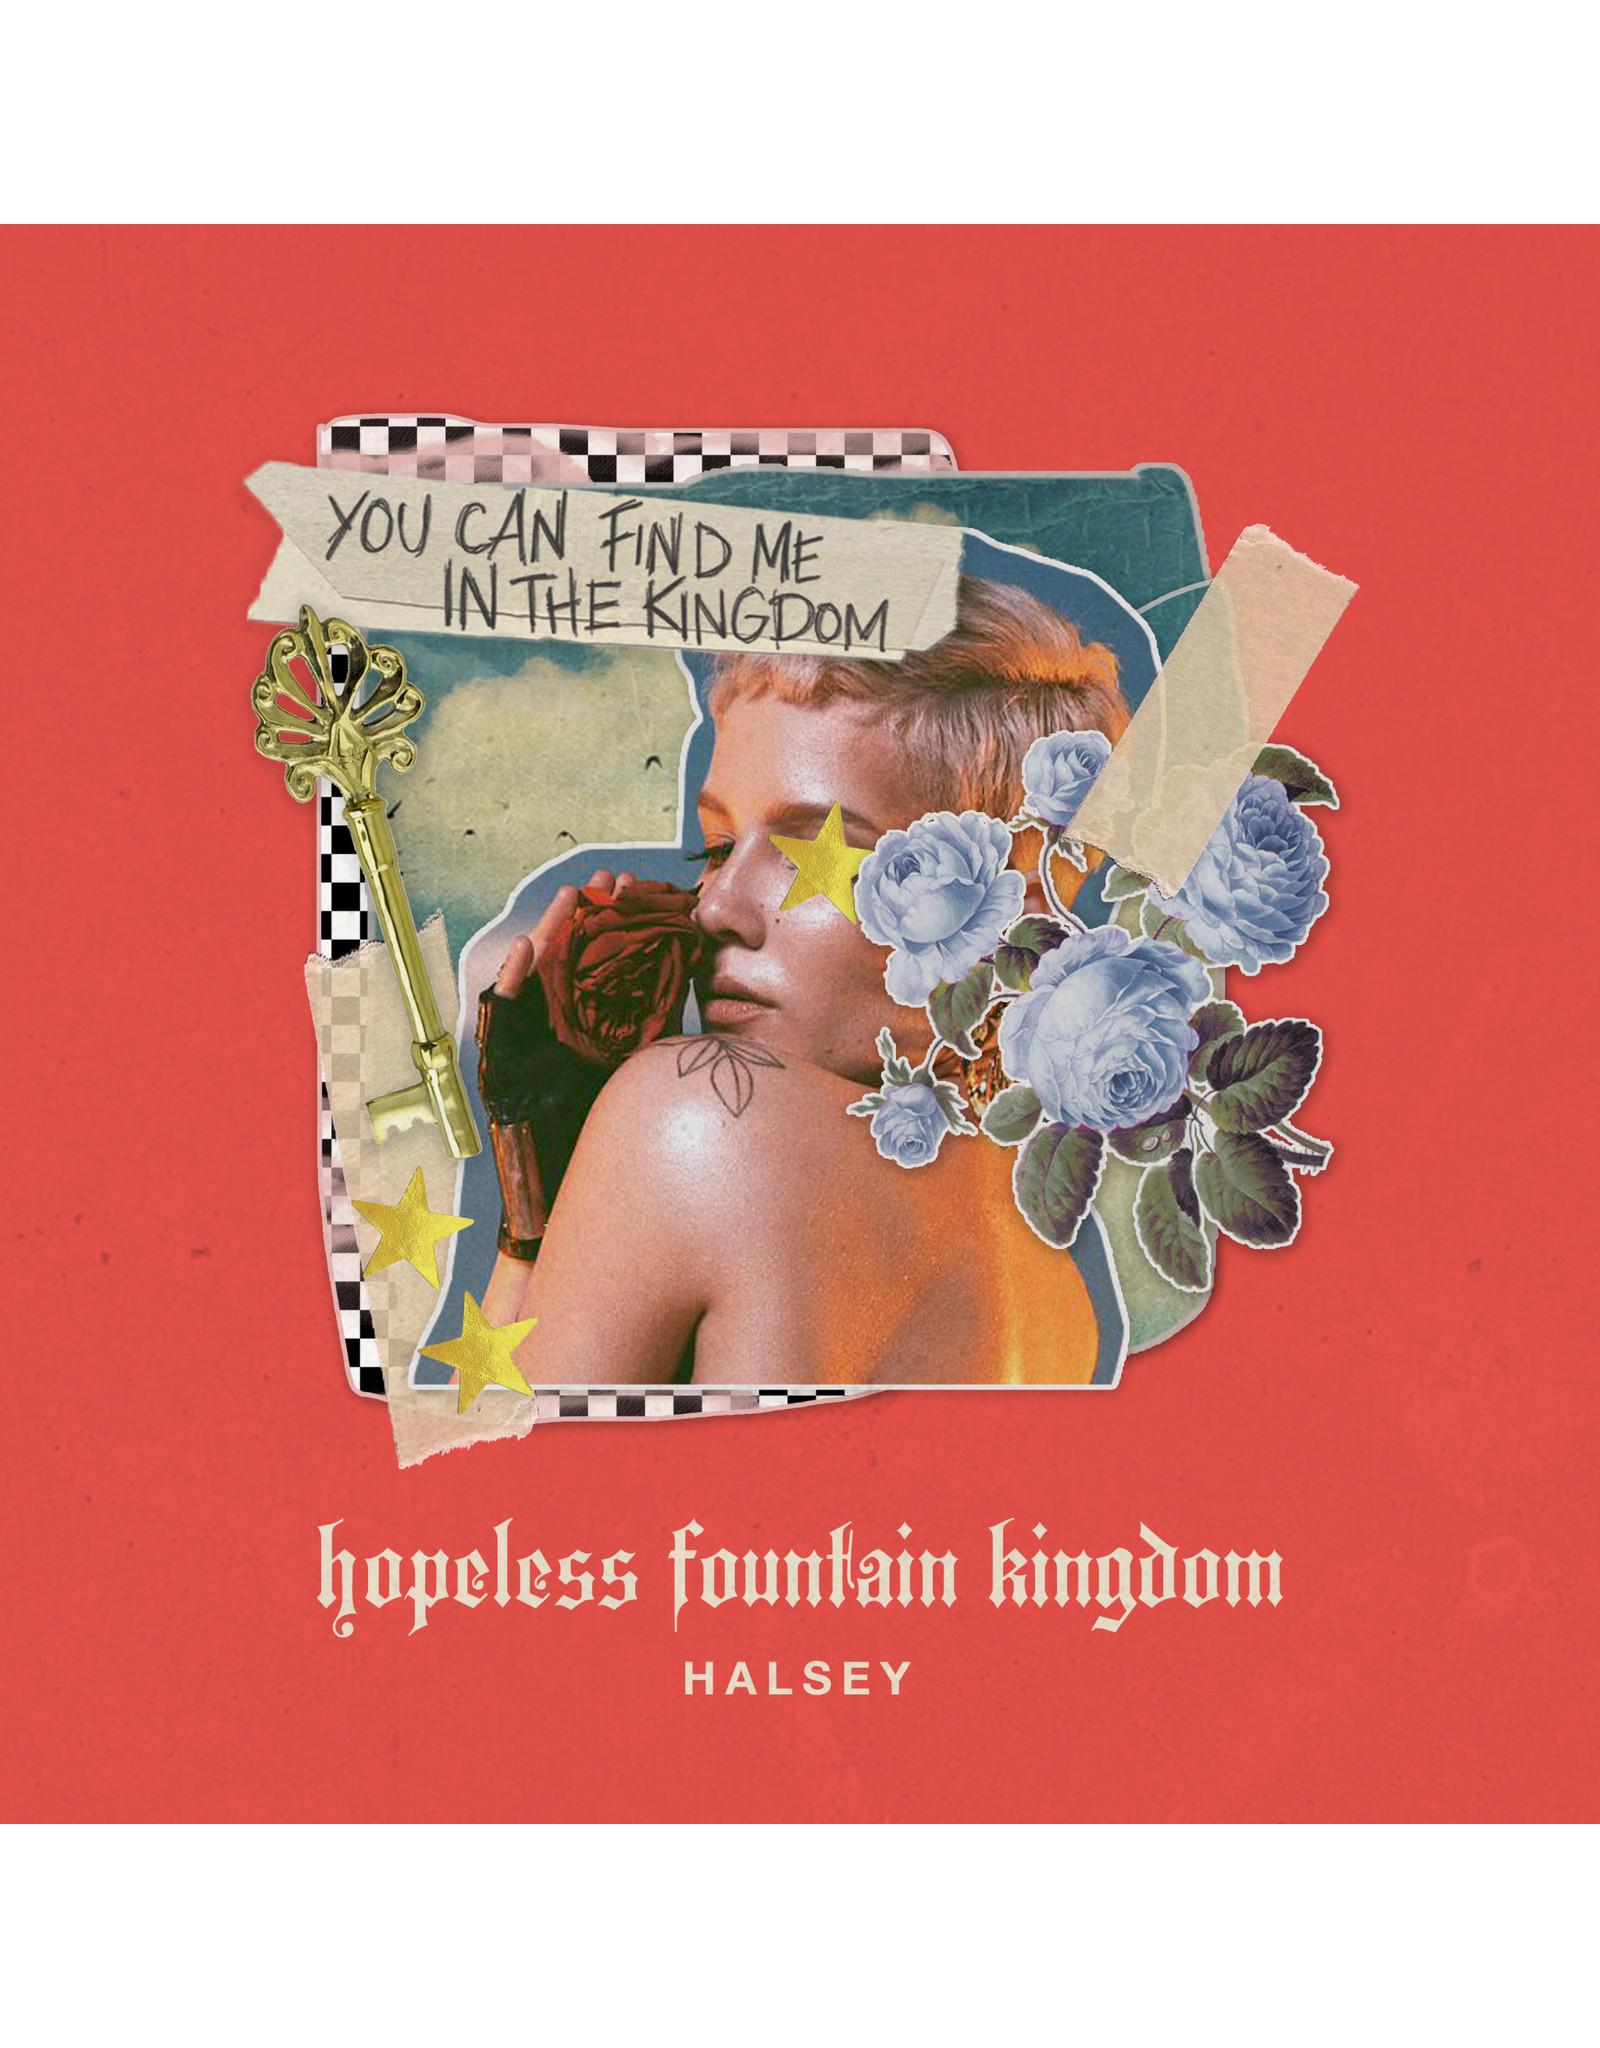 Halsey - Hopeless Fountain Kingdom (Exclusive Red Vinyl)